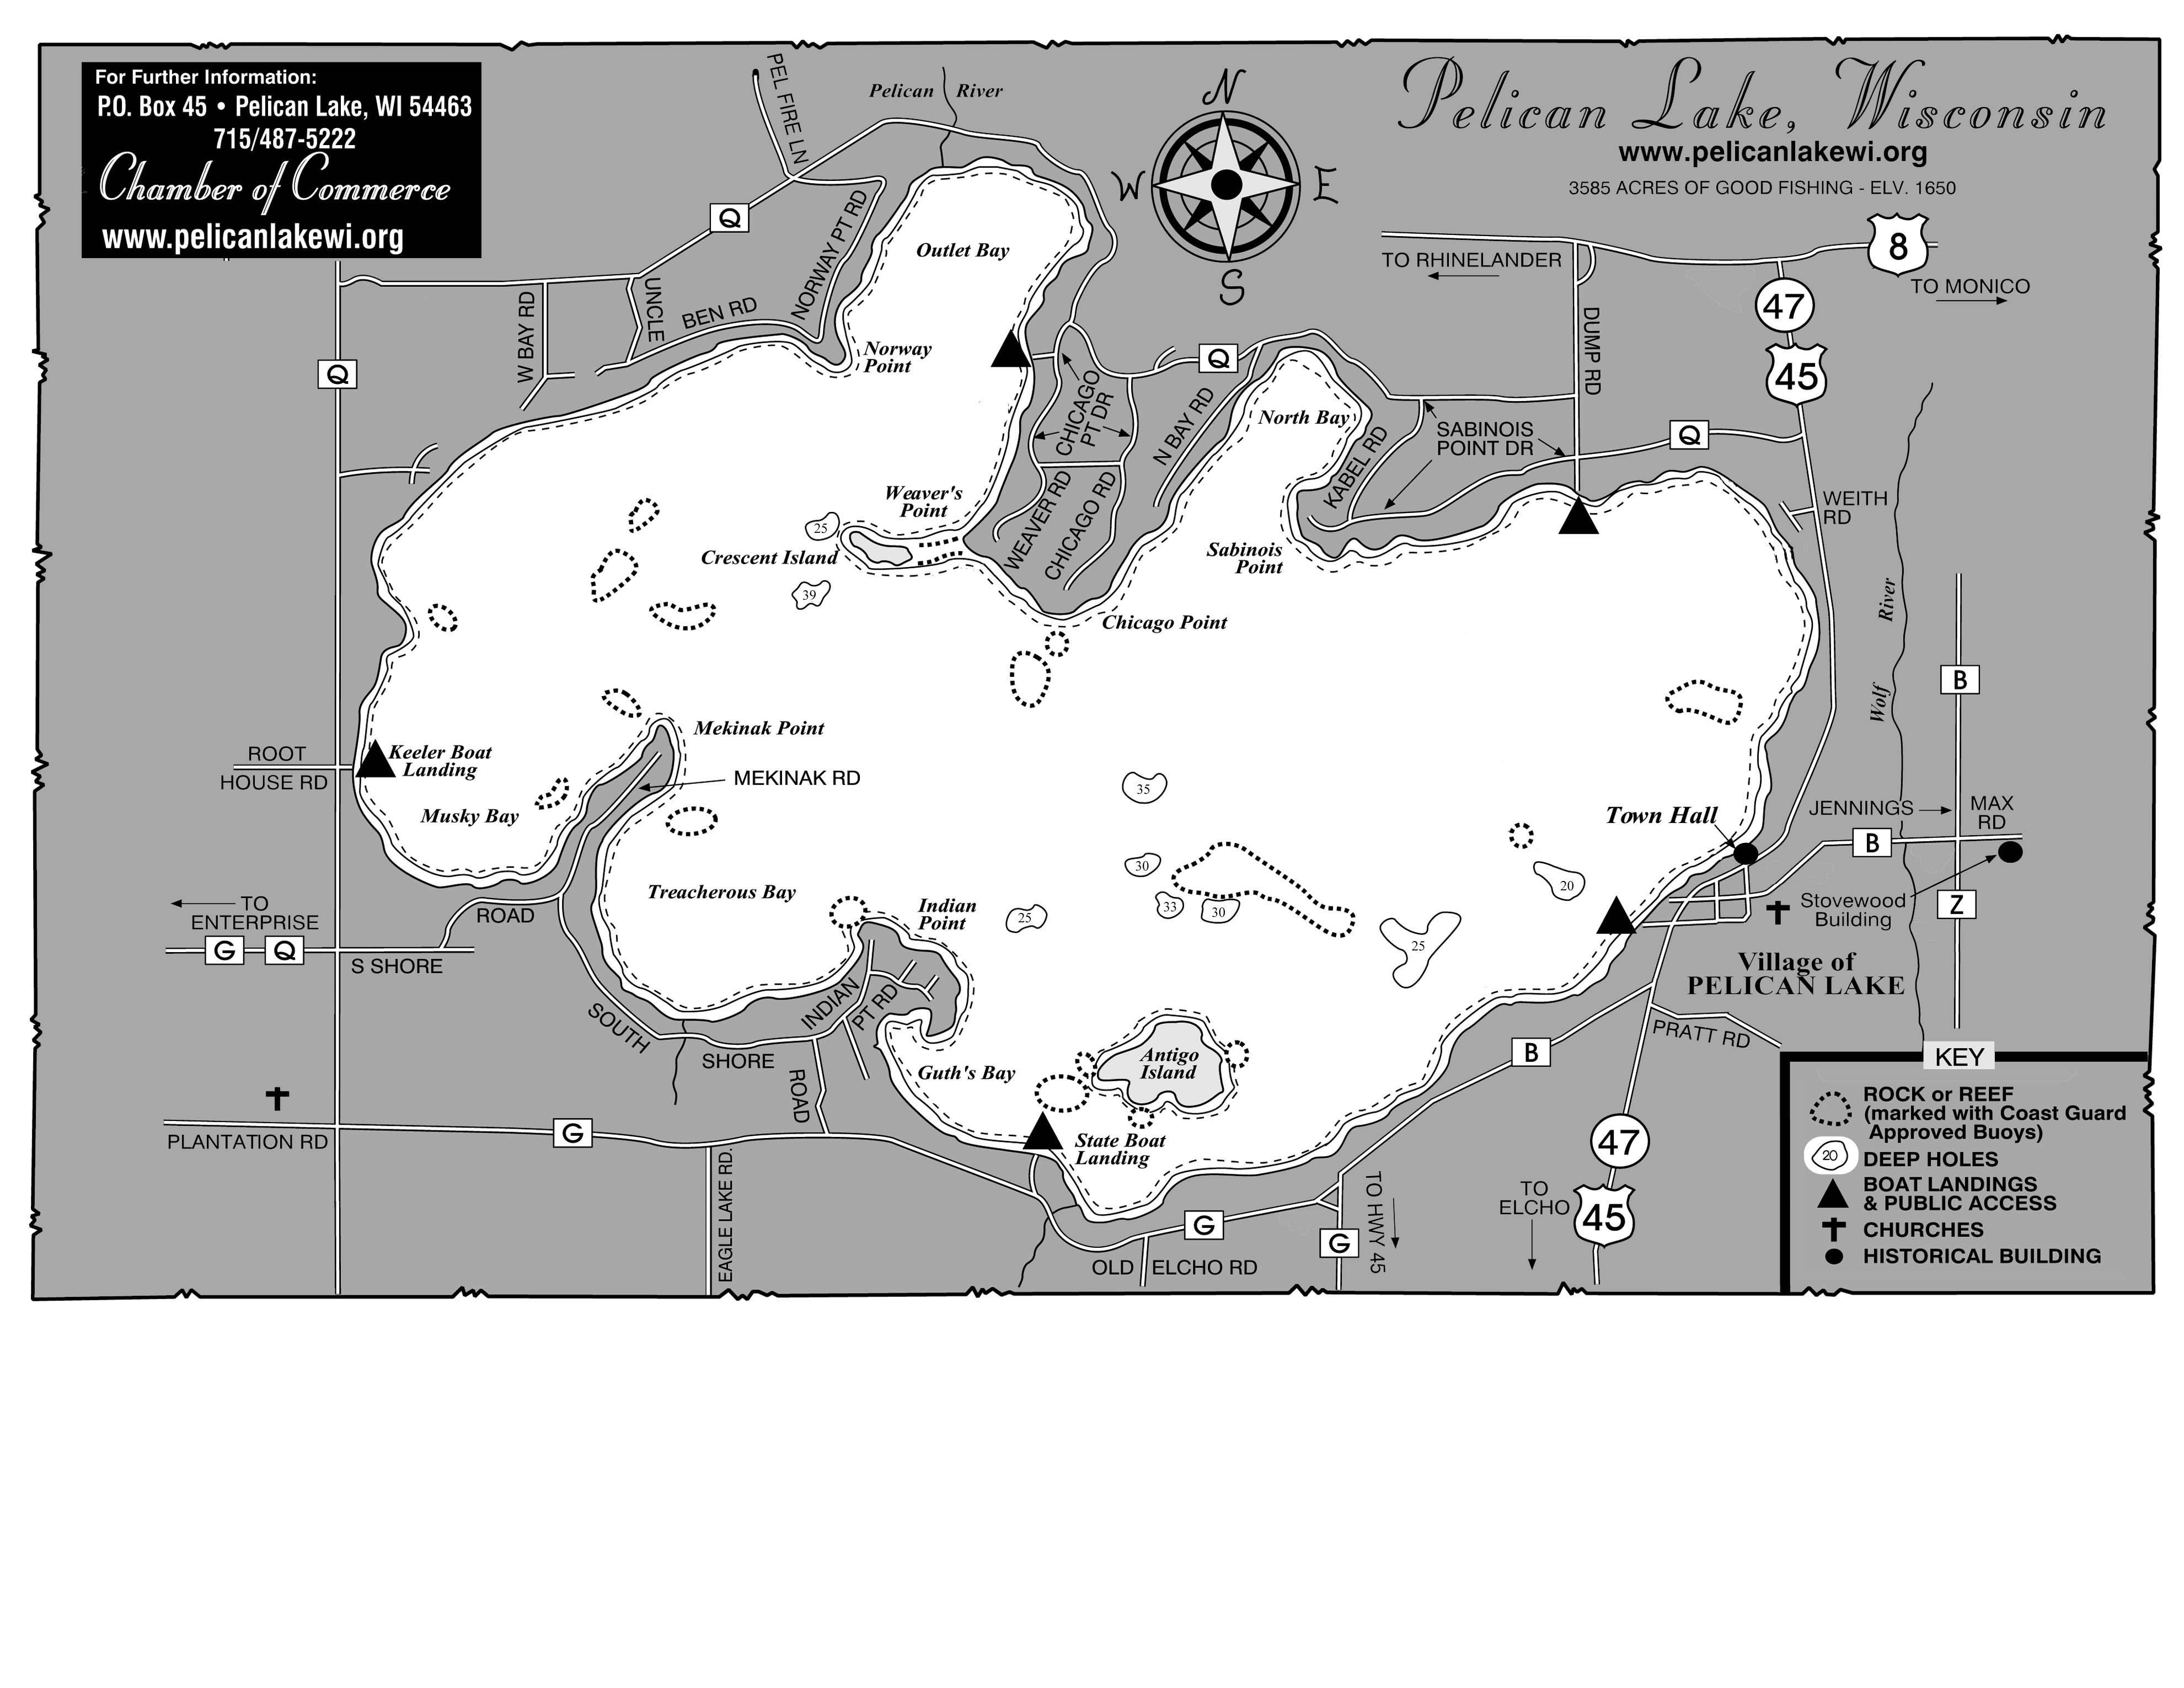 Pelican Lake Map Pelican Lake Wisconsin Mappery - Wisconsin topographic lake maps